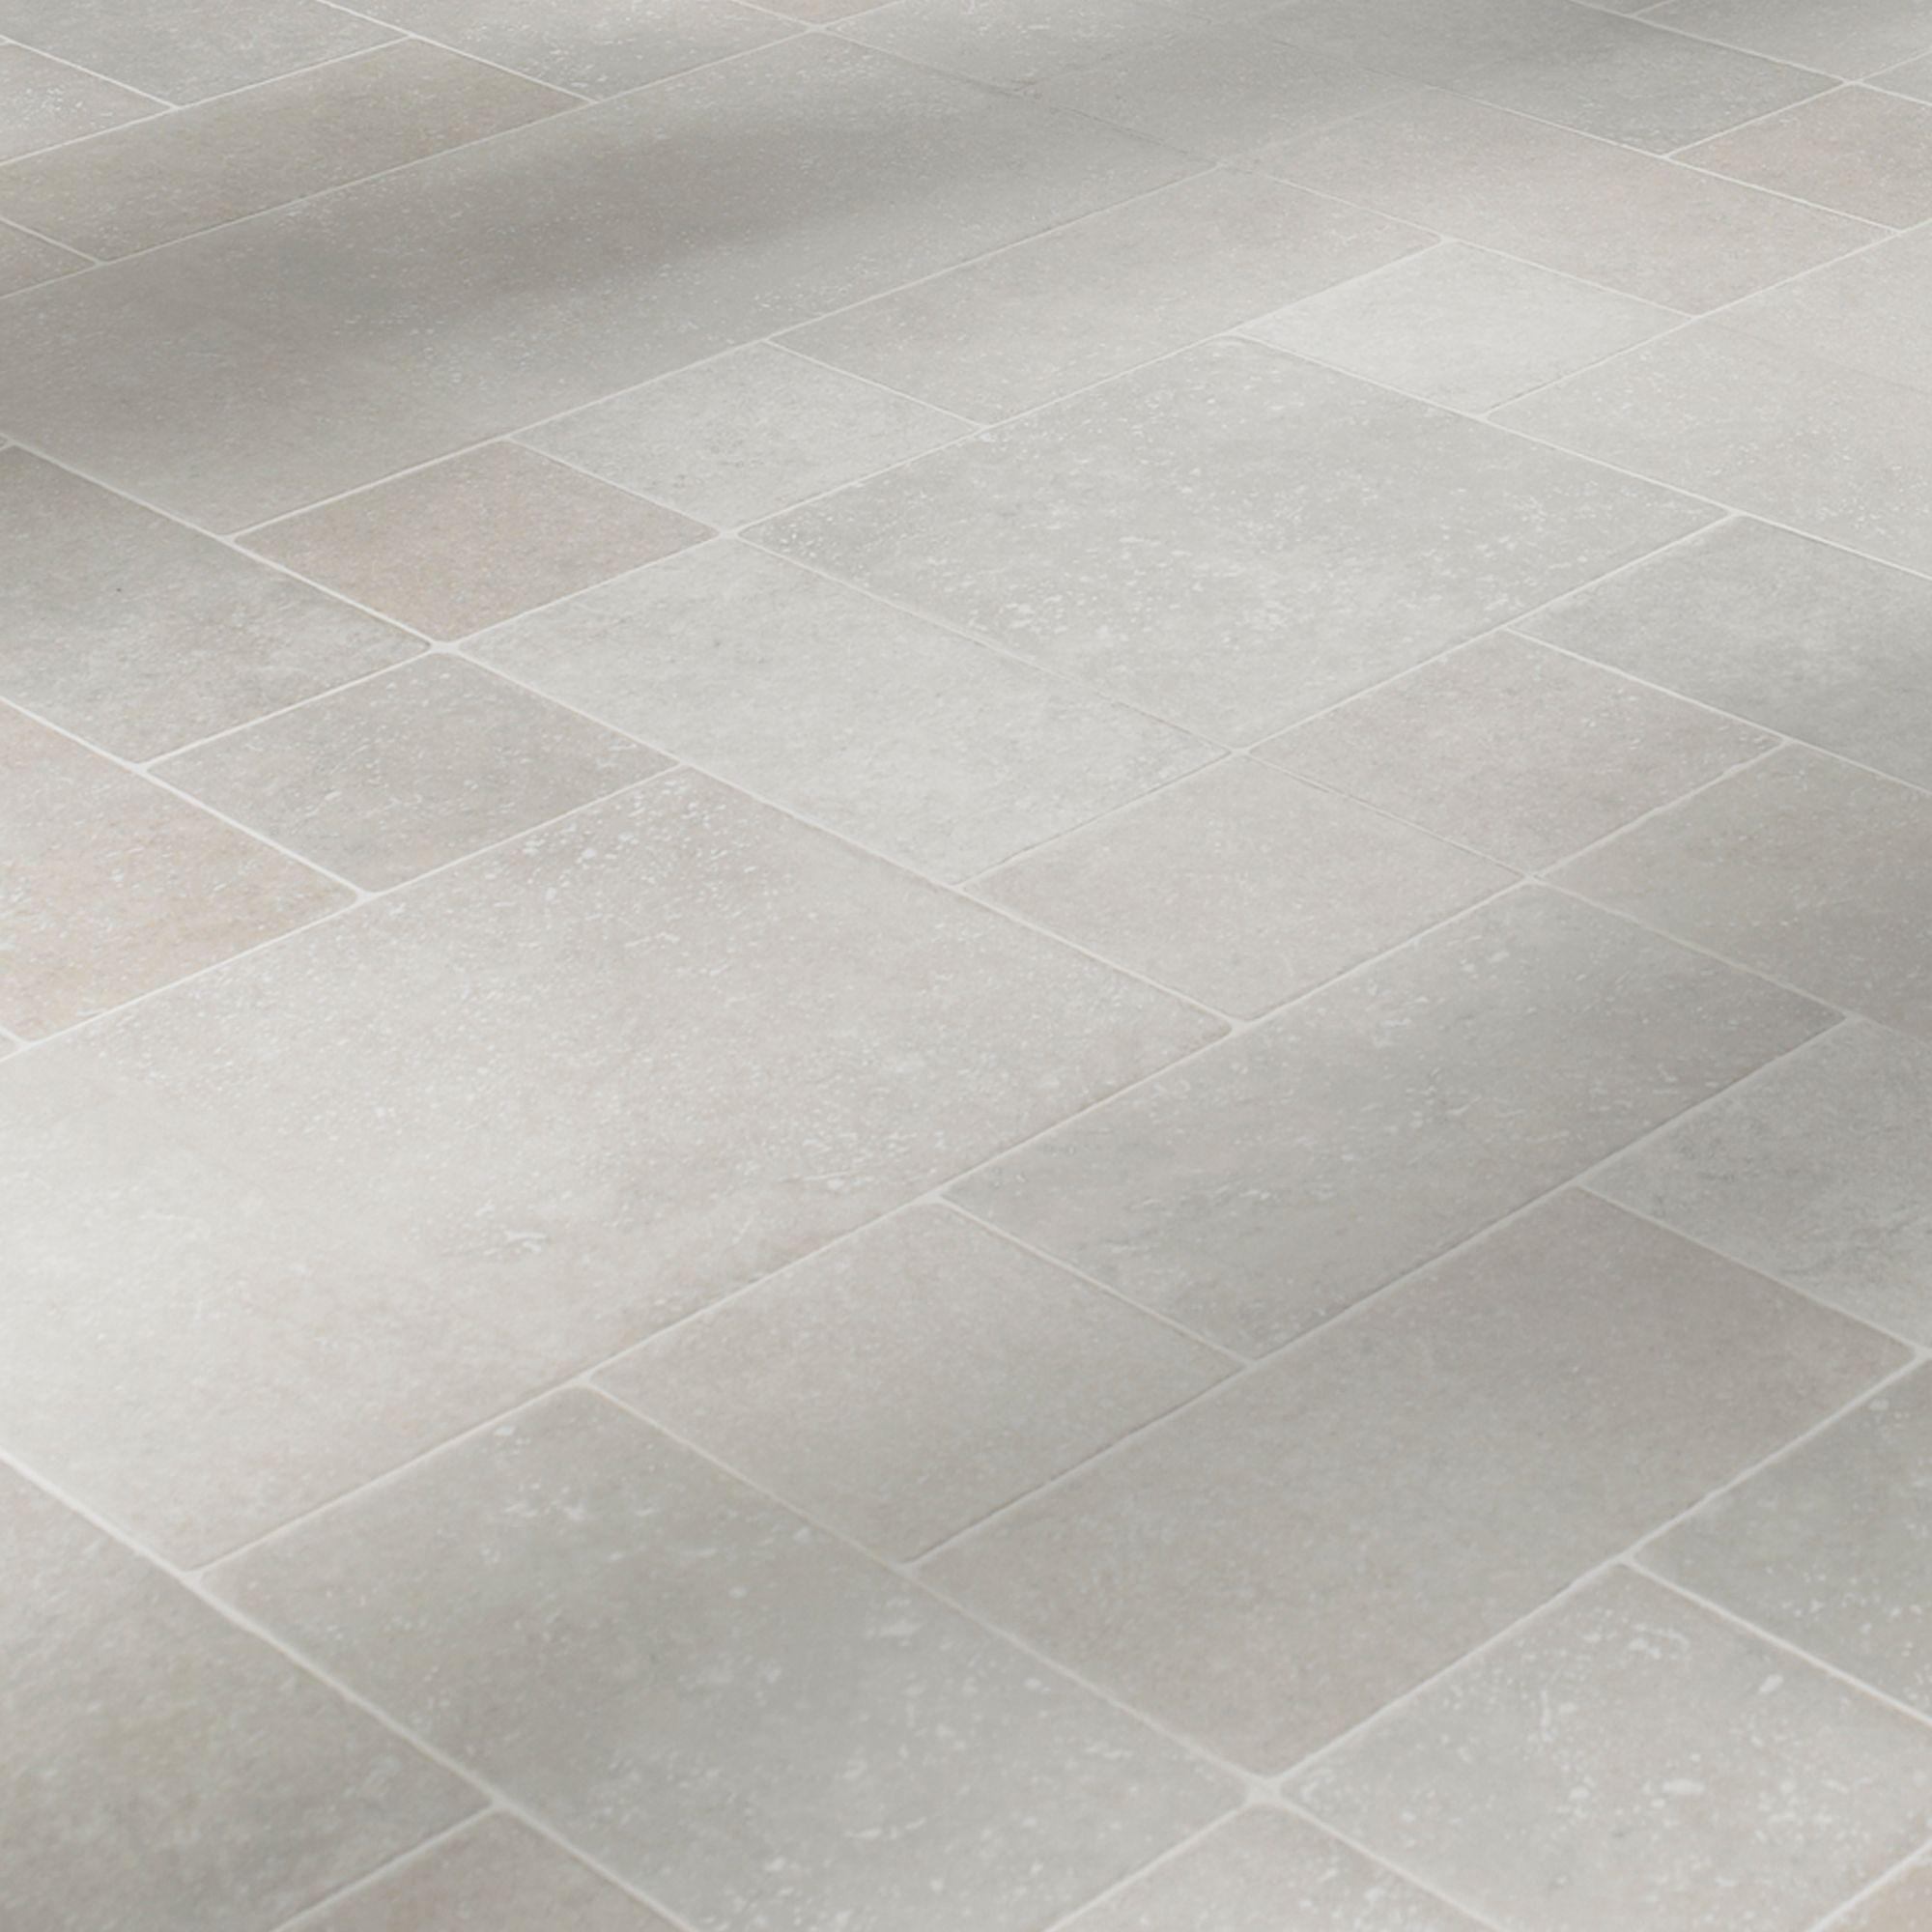 kitchen laminate flooring Barbarita Limestone Effect Laminate Flooring 1 86 m Pack